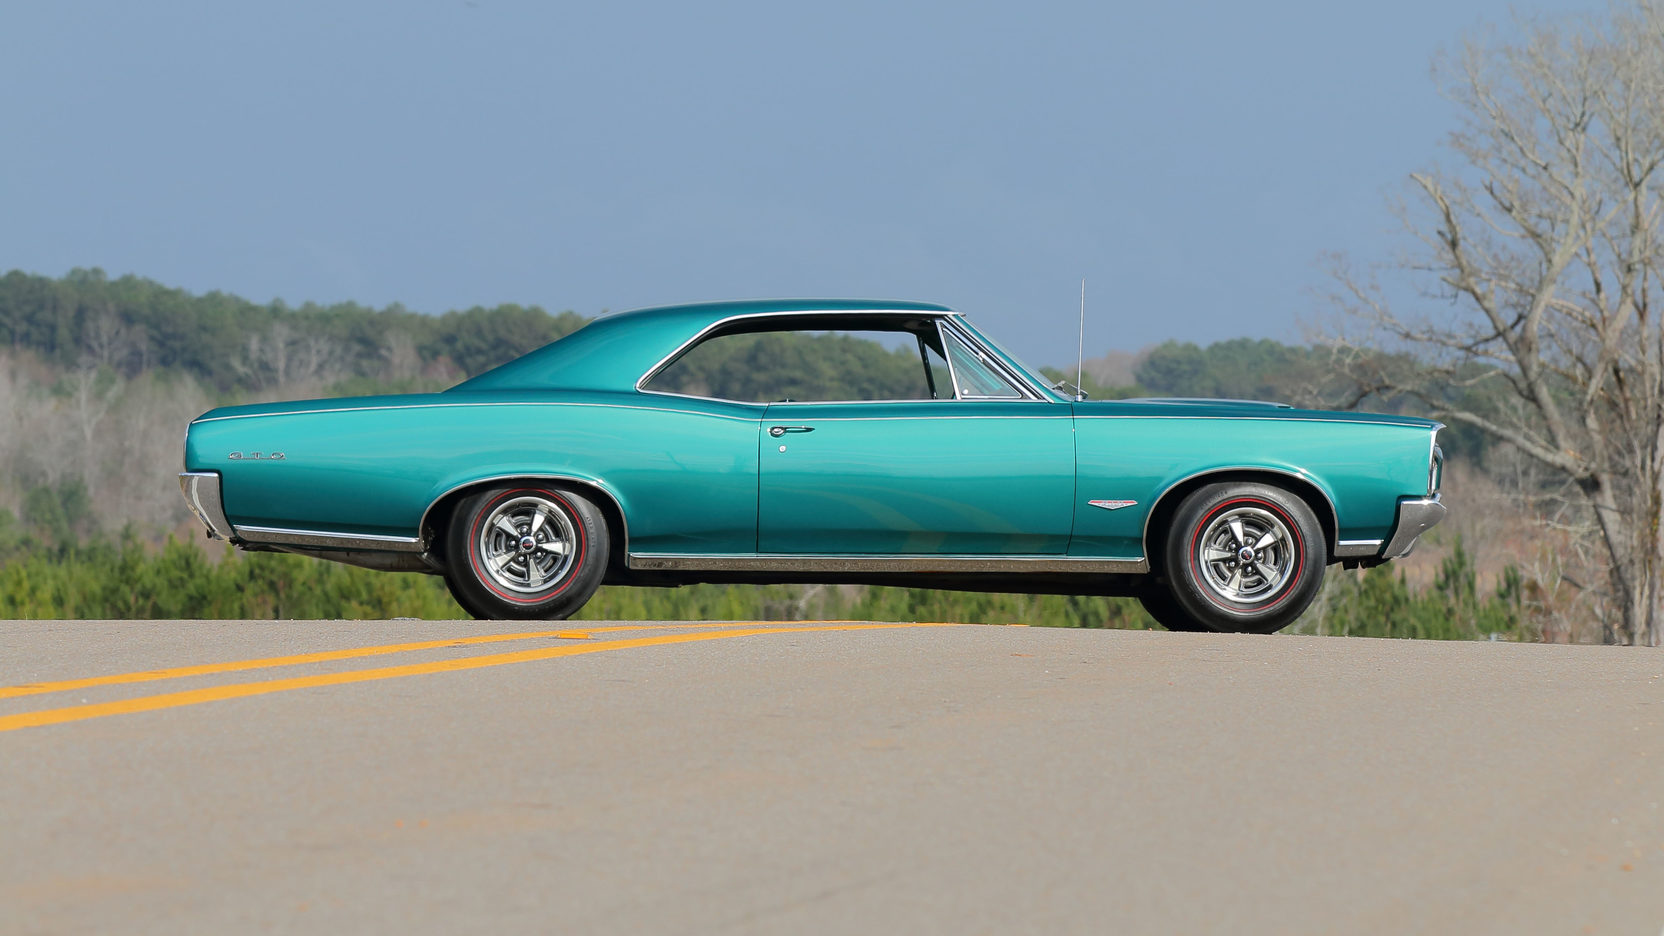 1966 Pontiac GTO side